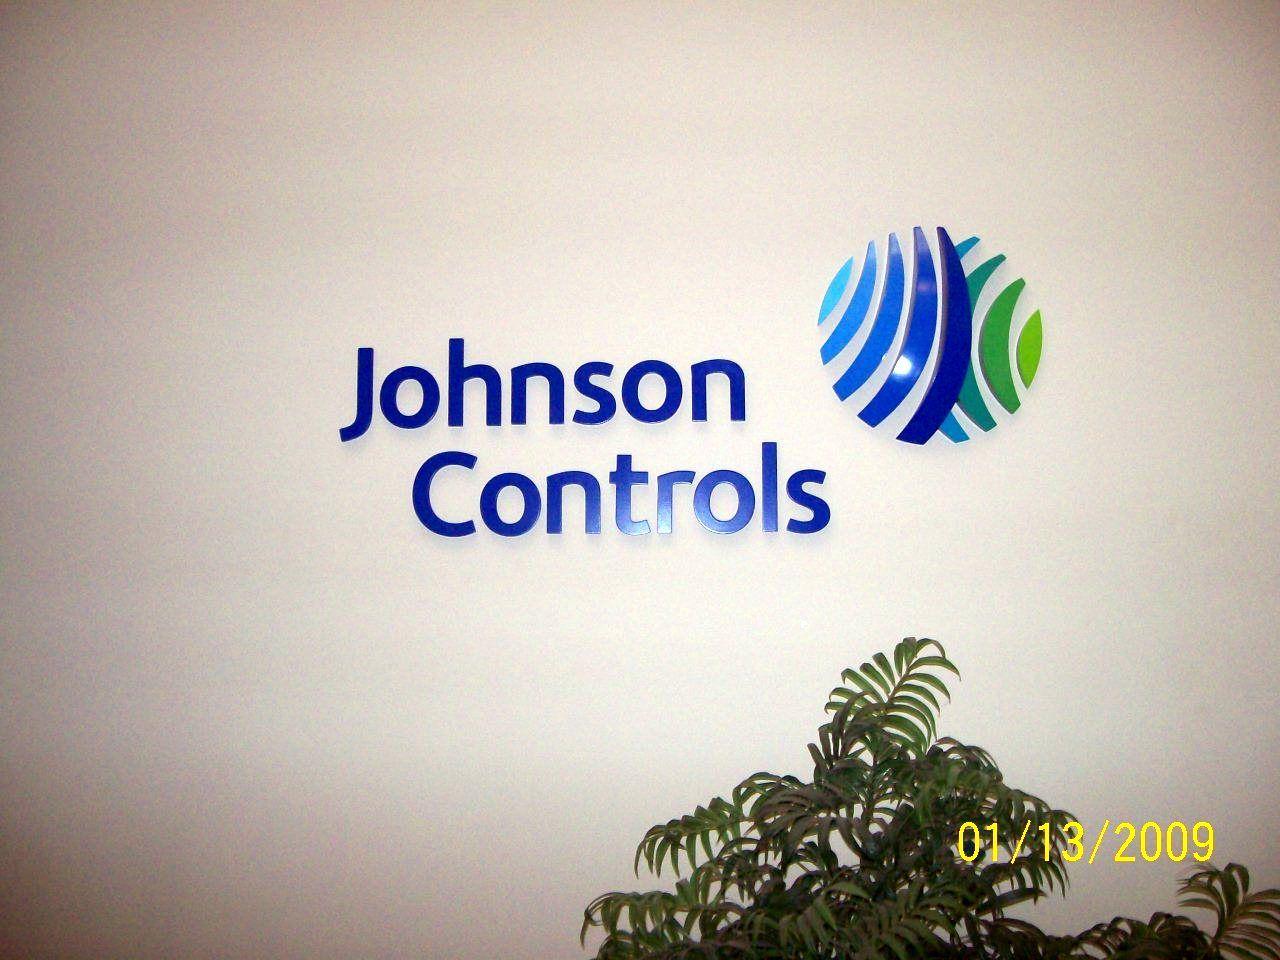 Johnson Controls corporate identity reception sign